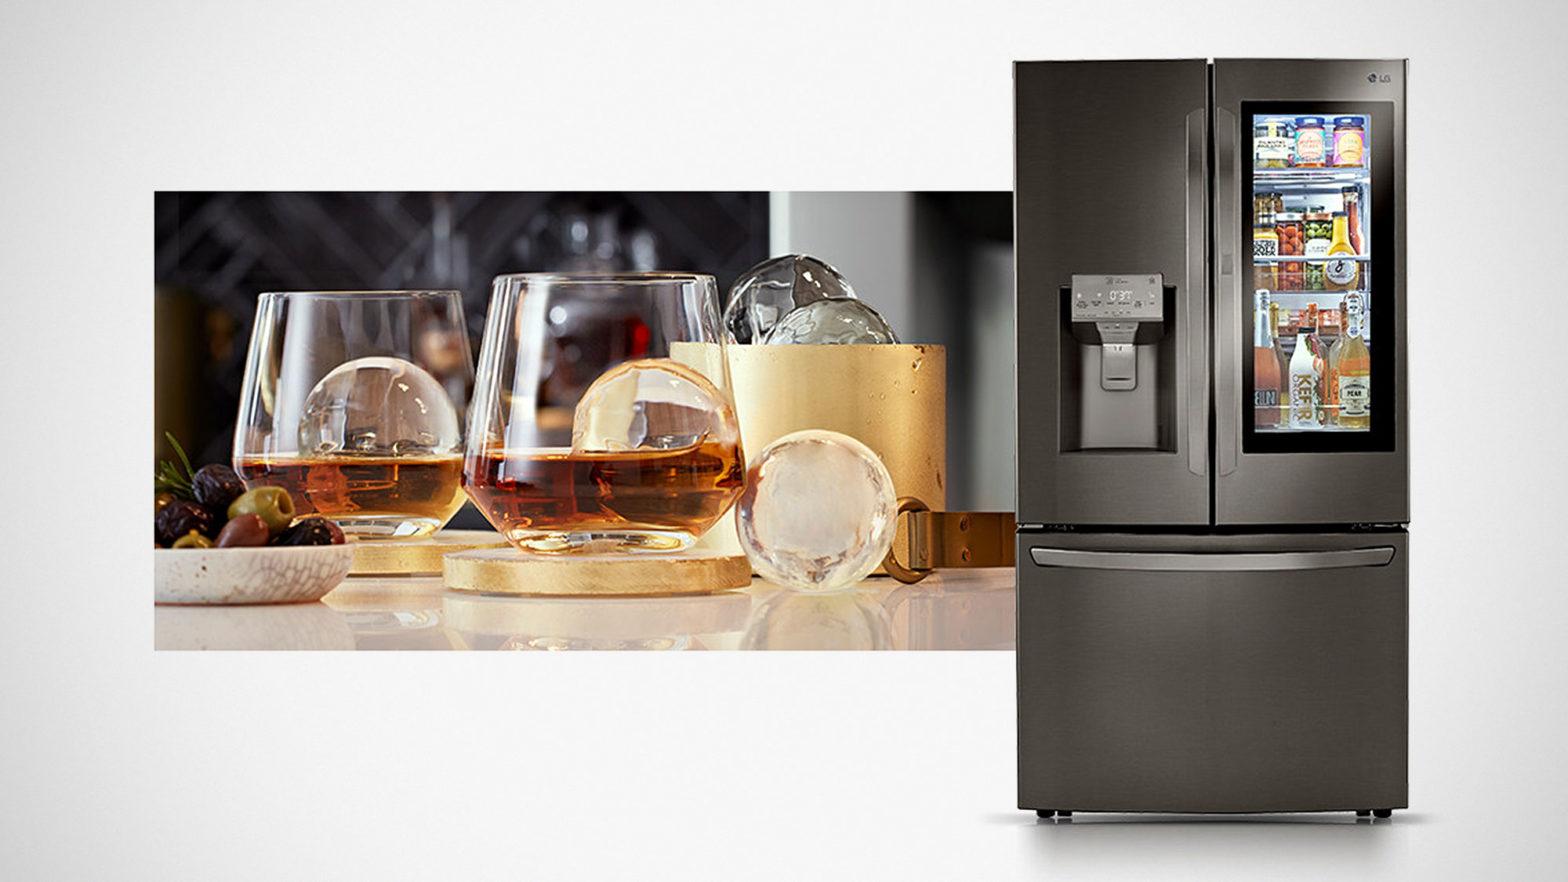 LG InstaView Refrigerators with Craft Ice